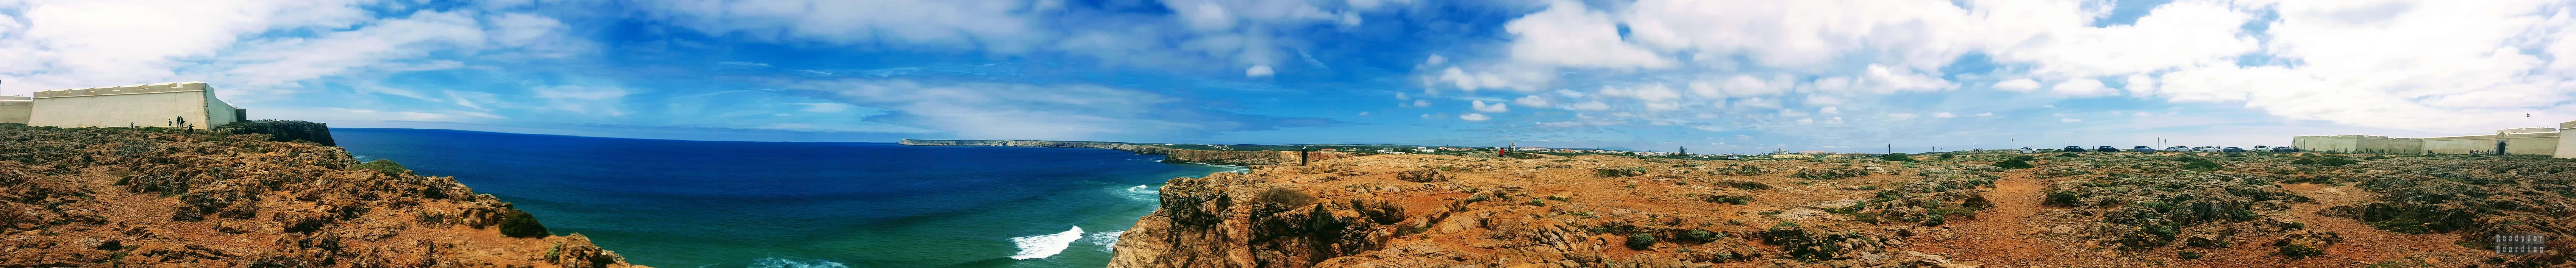 Panorama: Ponta de Sagres, Algarve, Portugalia